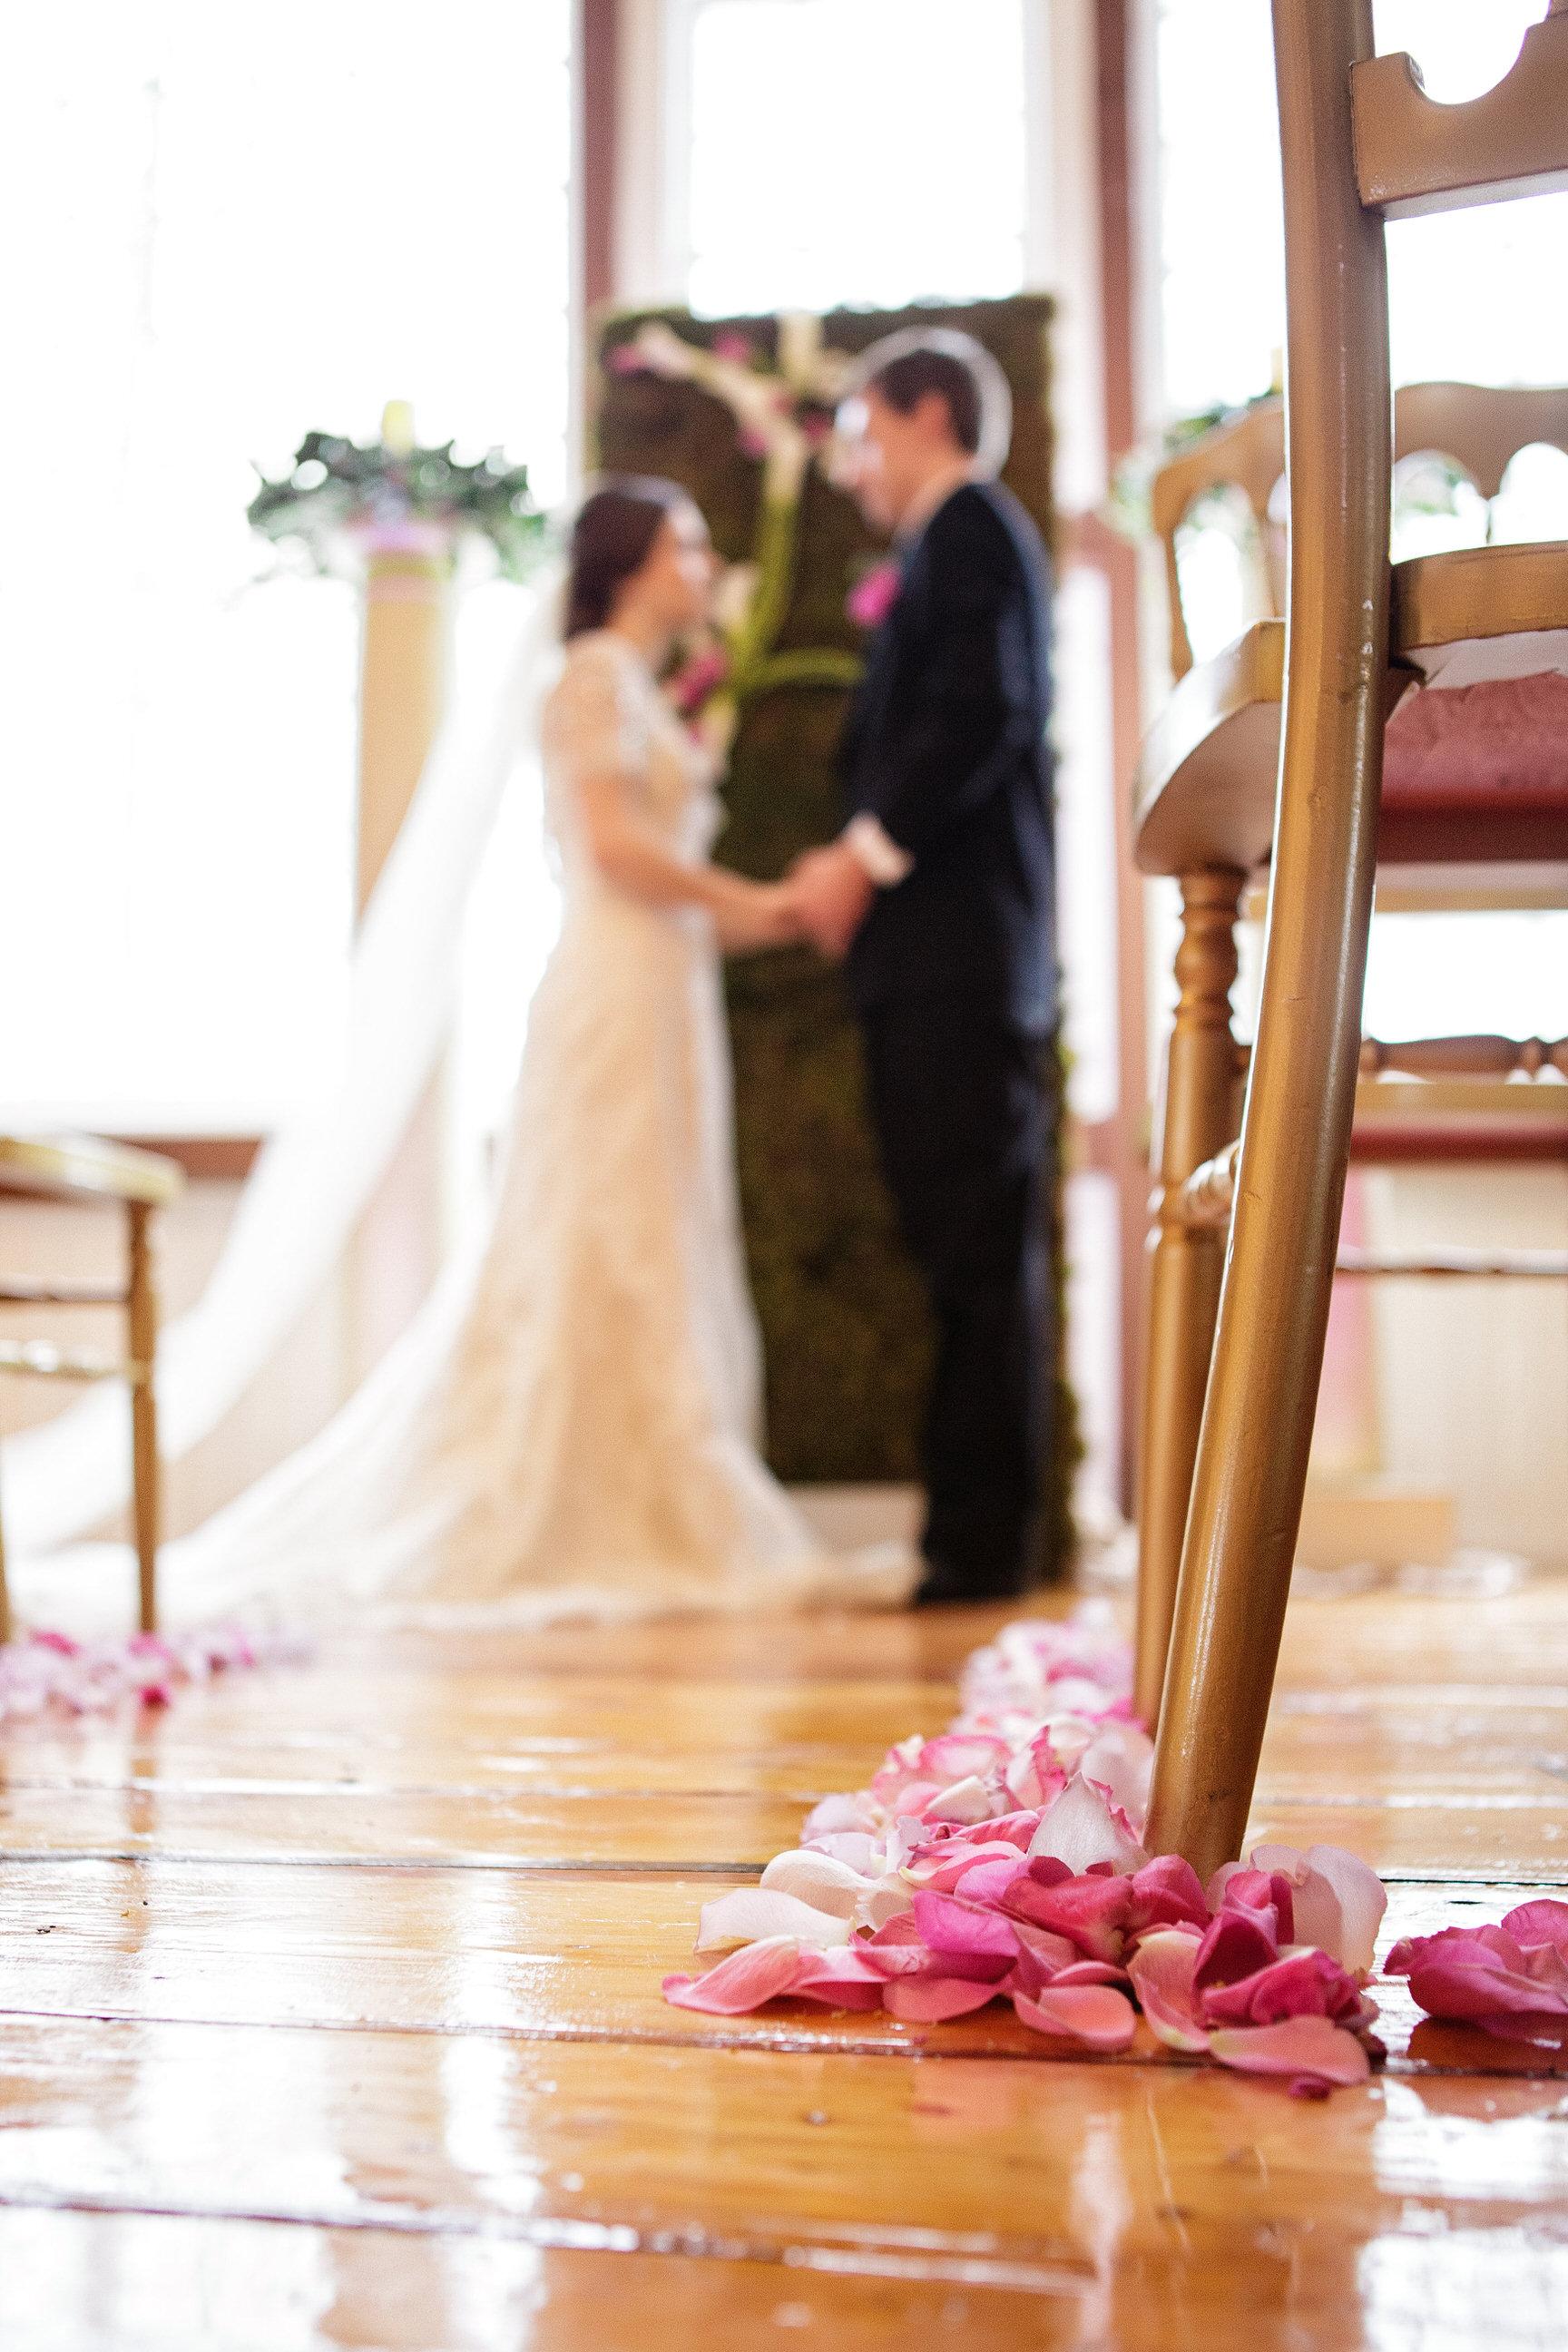 07 Flower Wall Ceremony Monogram Backdrop Radiant Orchid Philadelphia Wedding Florist.jpg